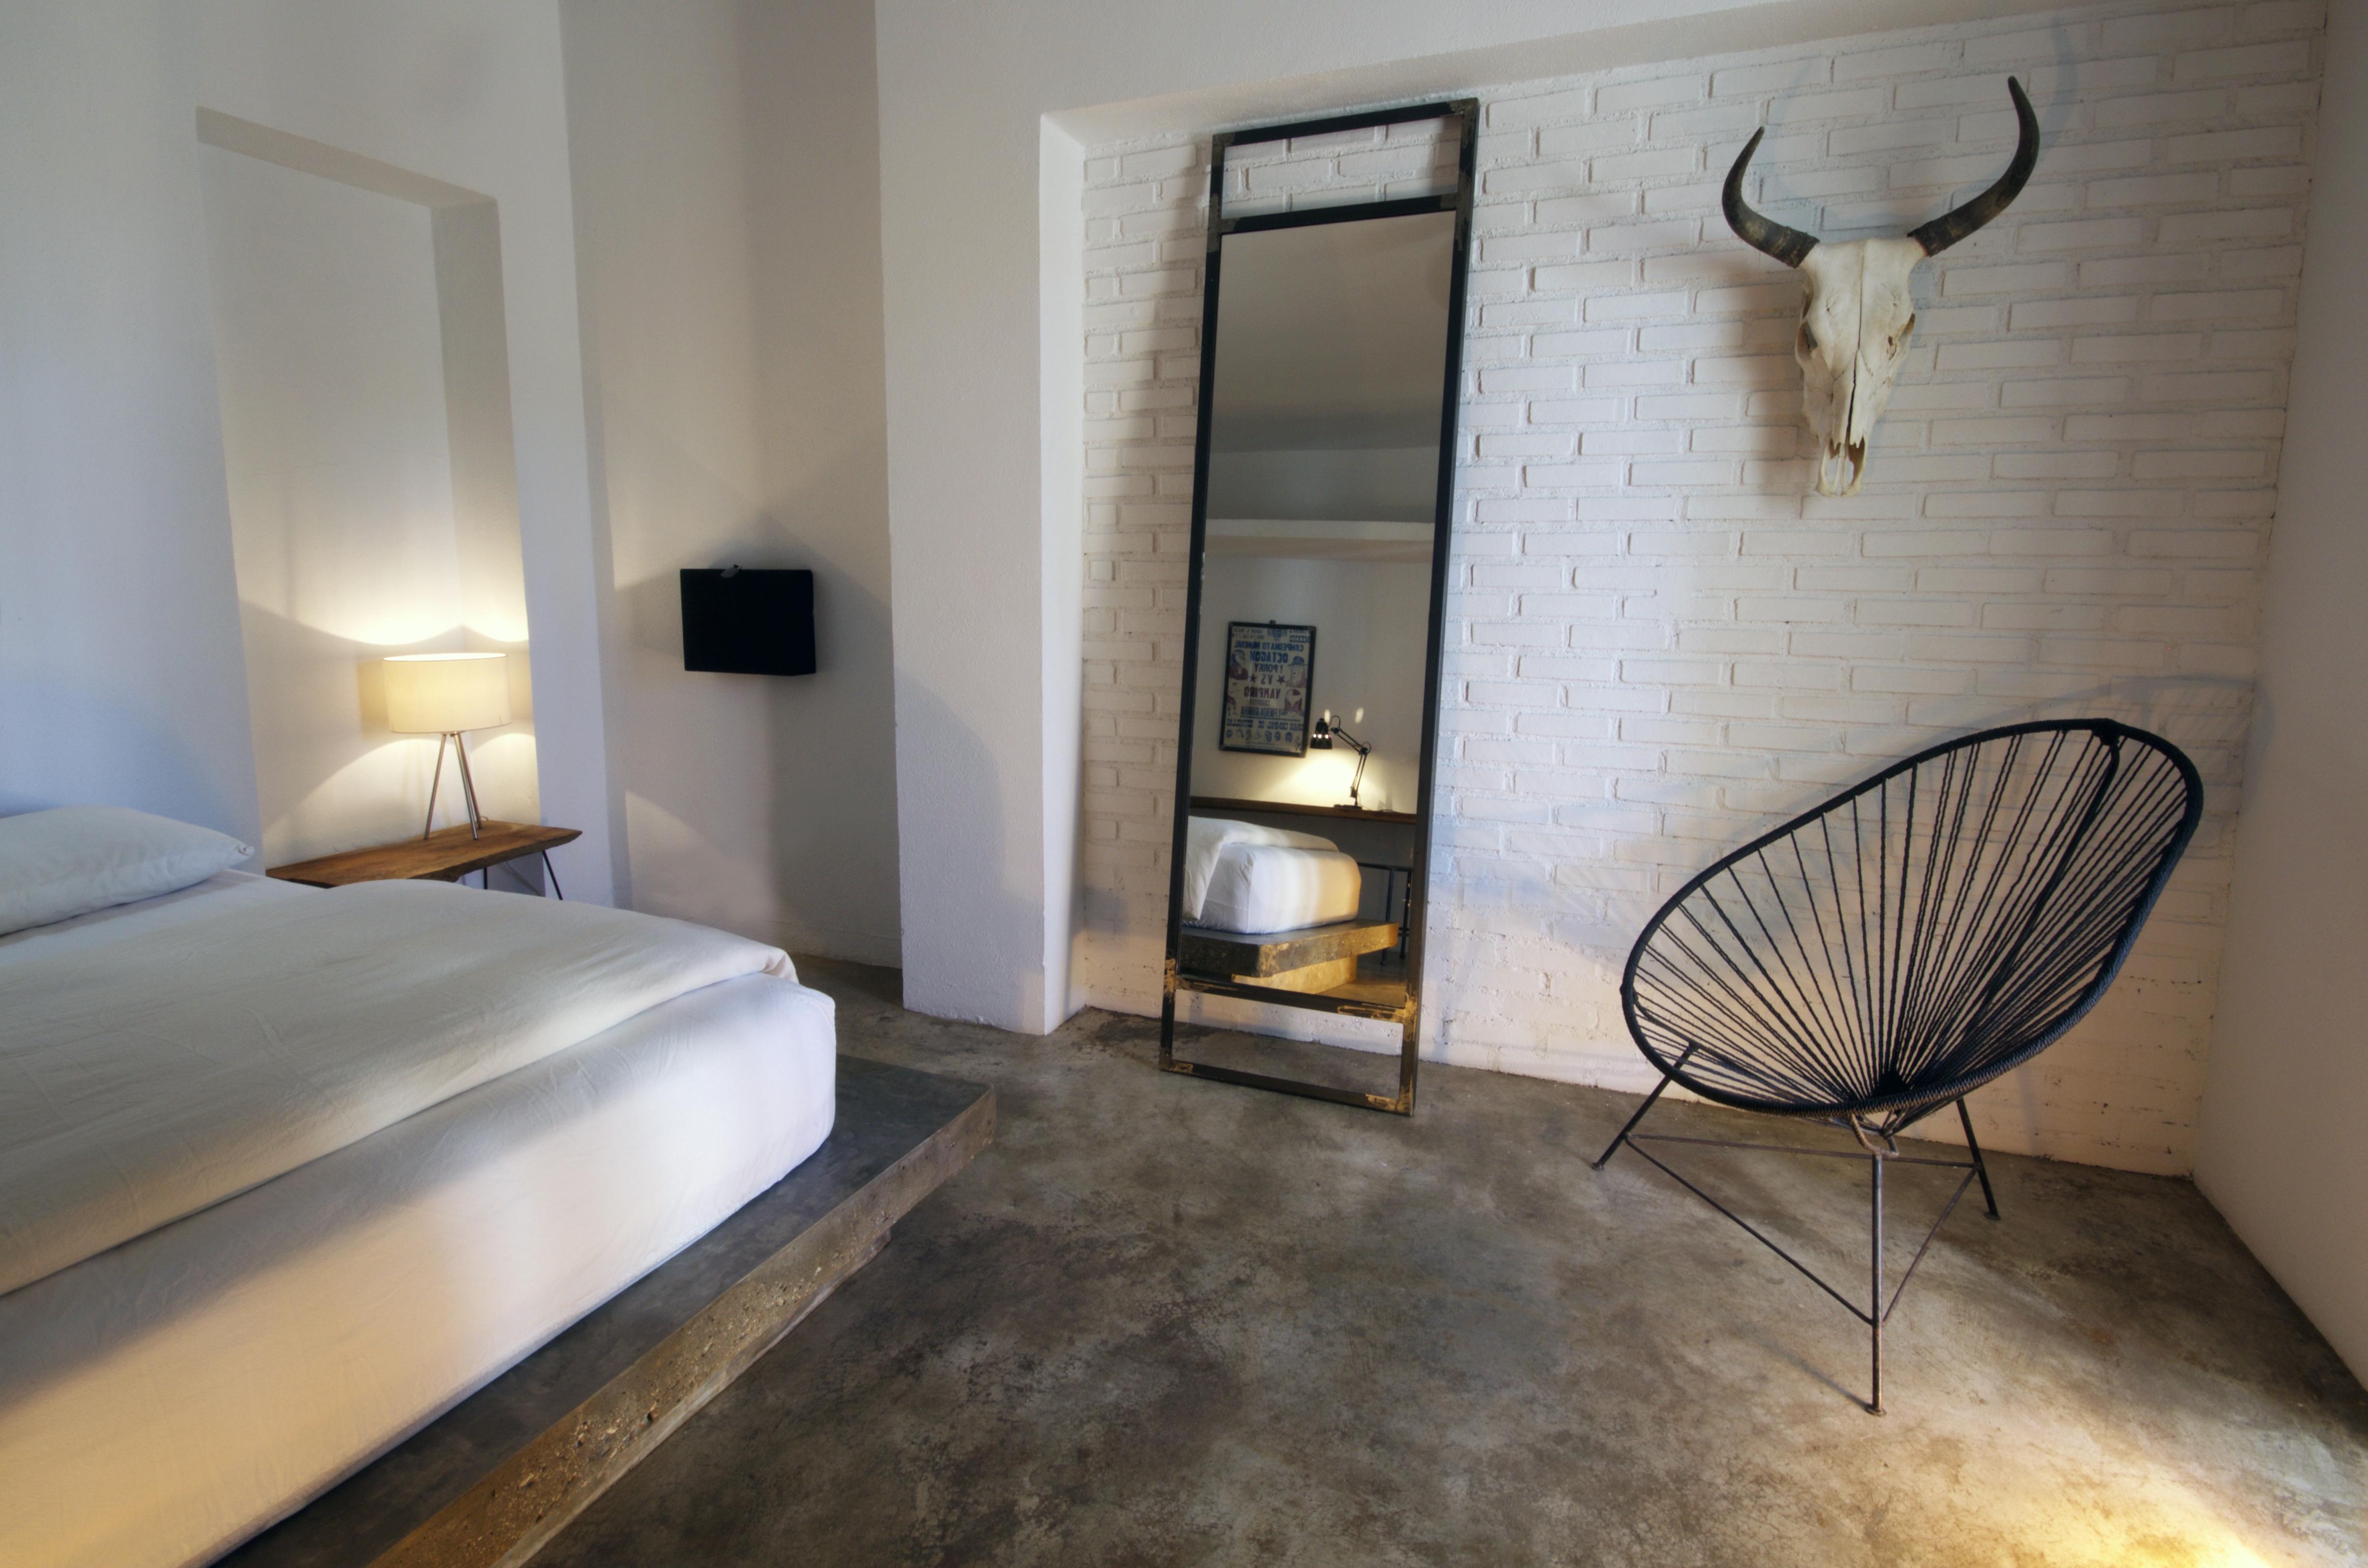 drift_san_jose_room & MY LATEST DESIGN HOTEL CRUSH: DRIFT SAN JOSÉ IN BAJA CALIFORNIA